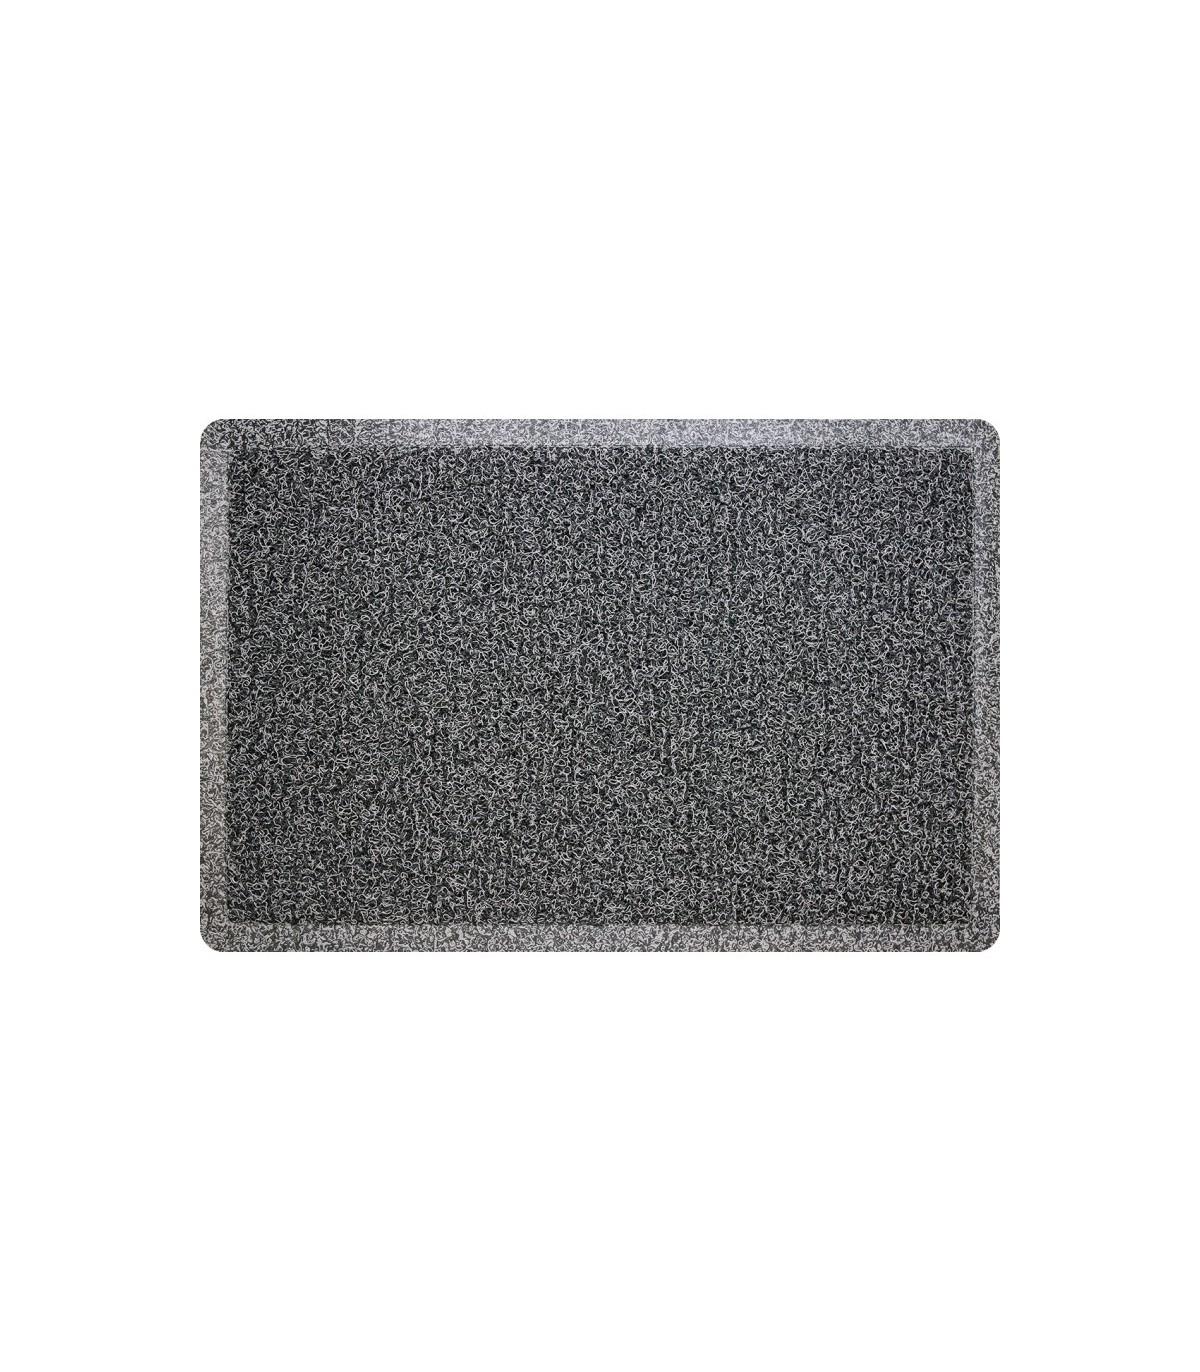 tapis d entree professionnel anti salete